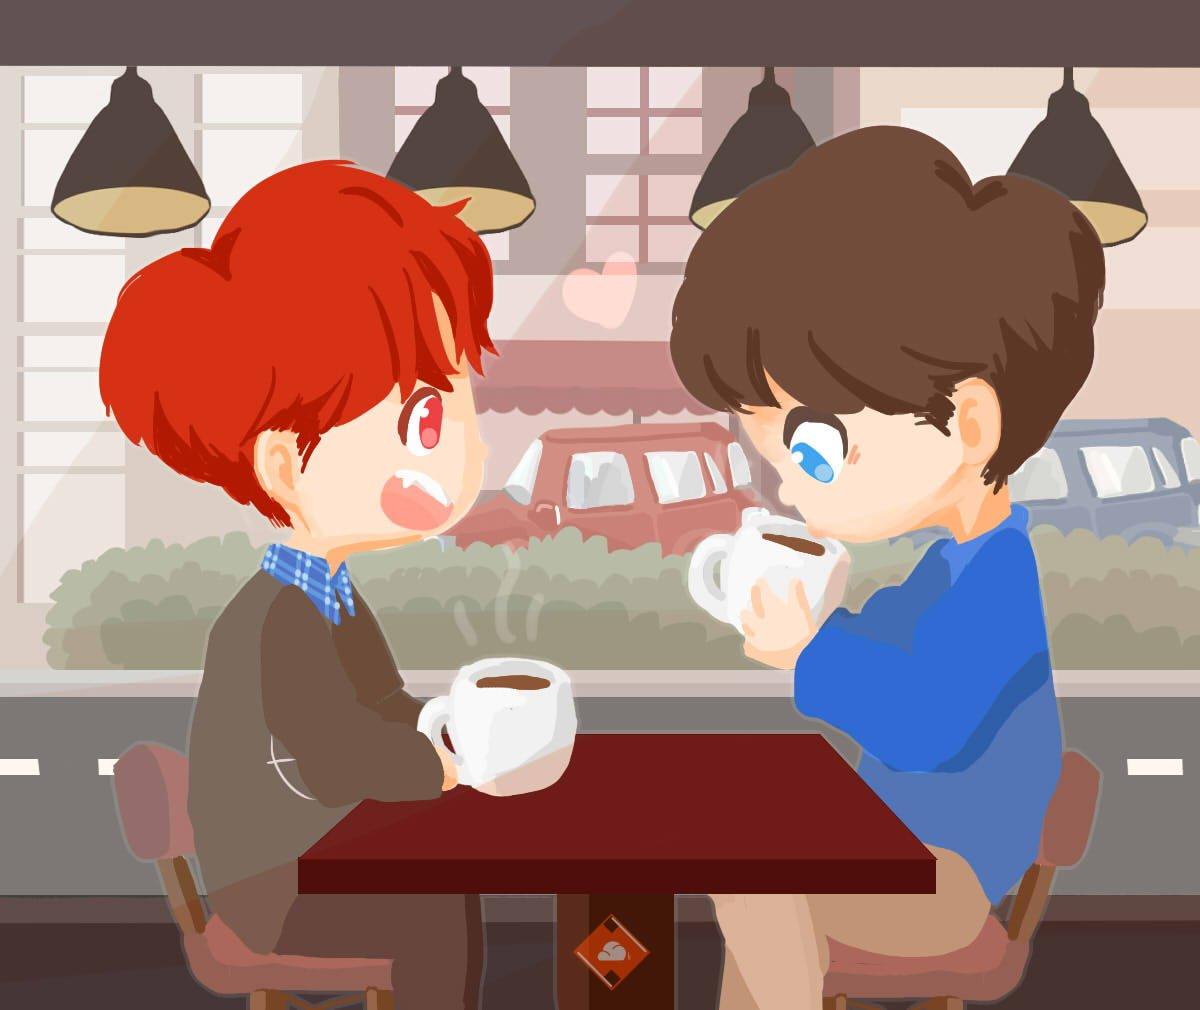 ☕️#markjin cafe date �� #GOT7fanart #mark #jinyoung https://t.co/a593jGYHvE